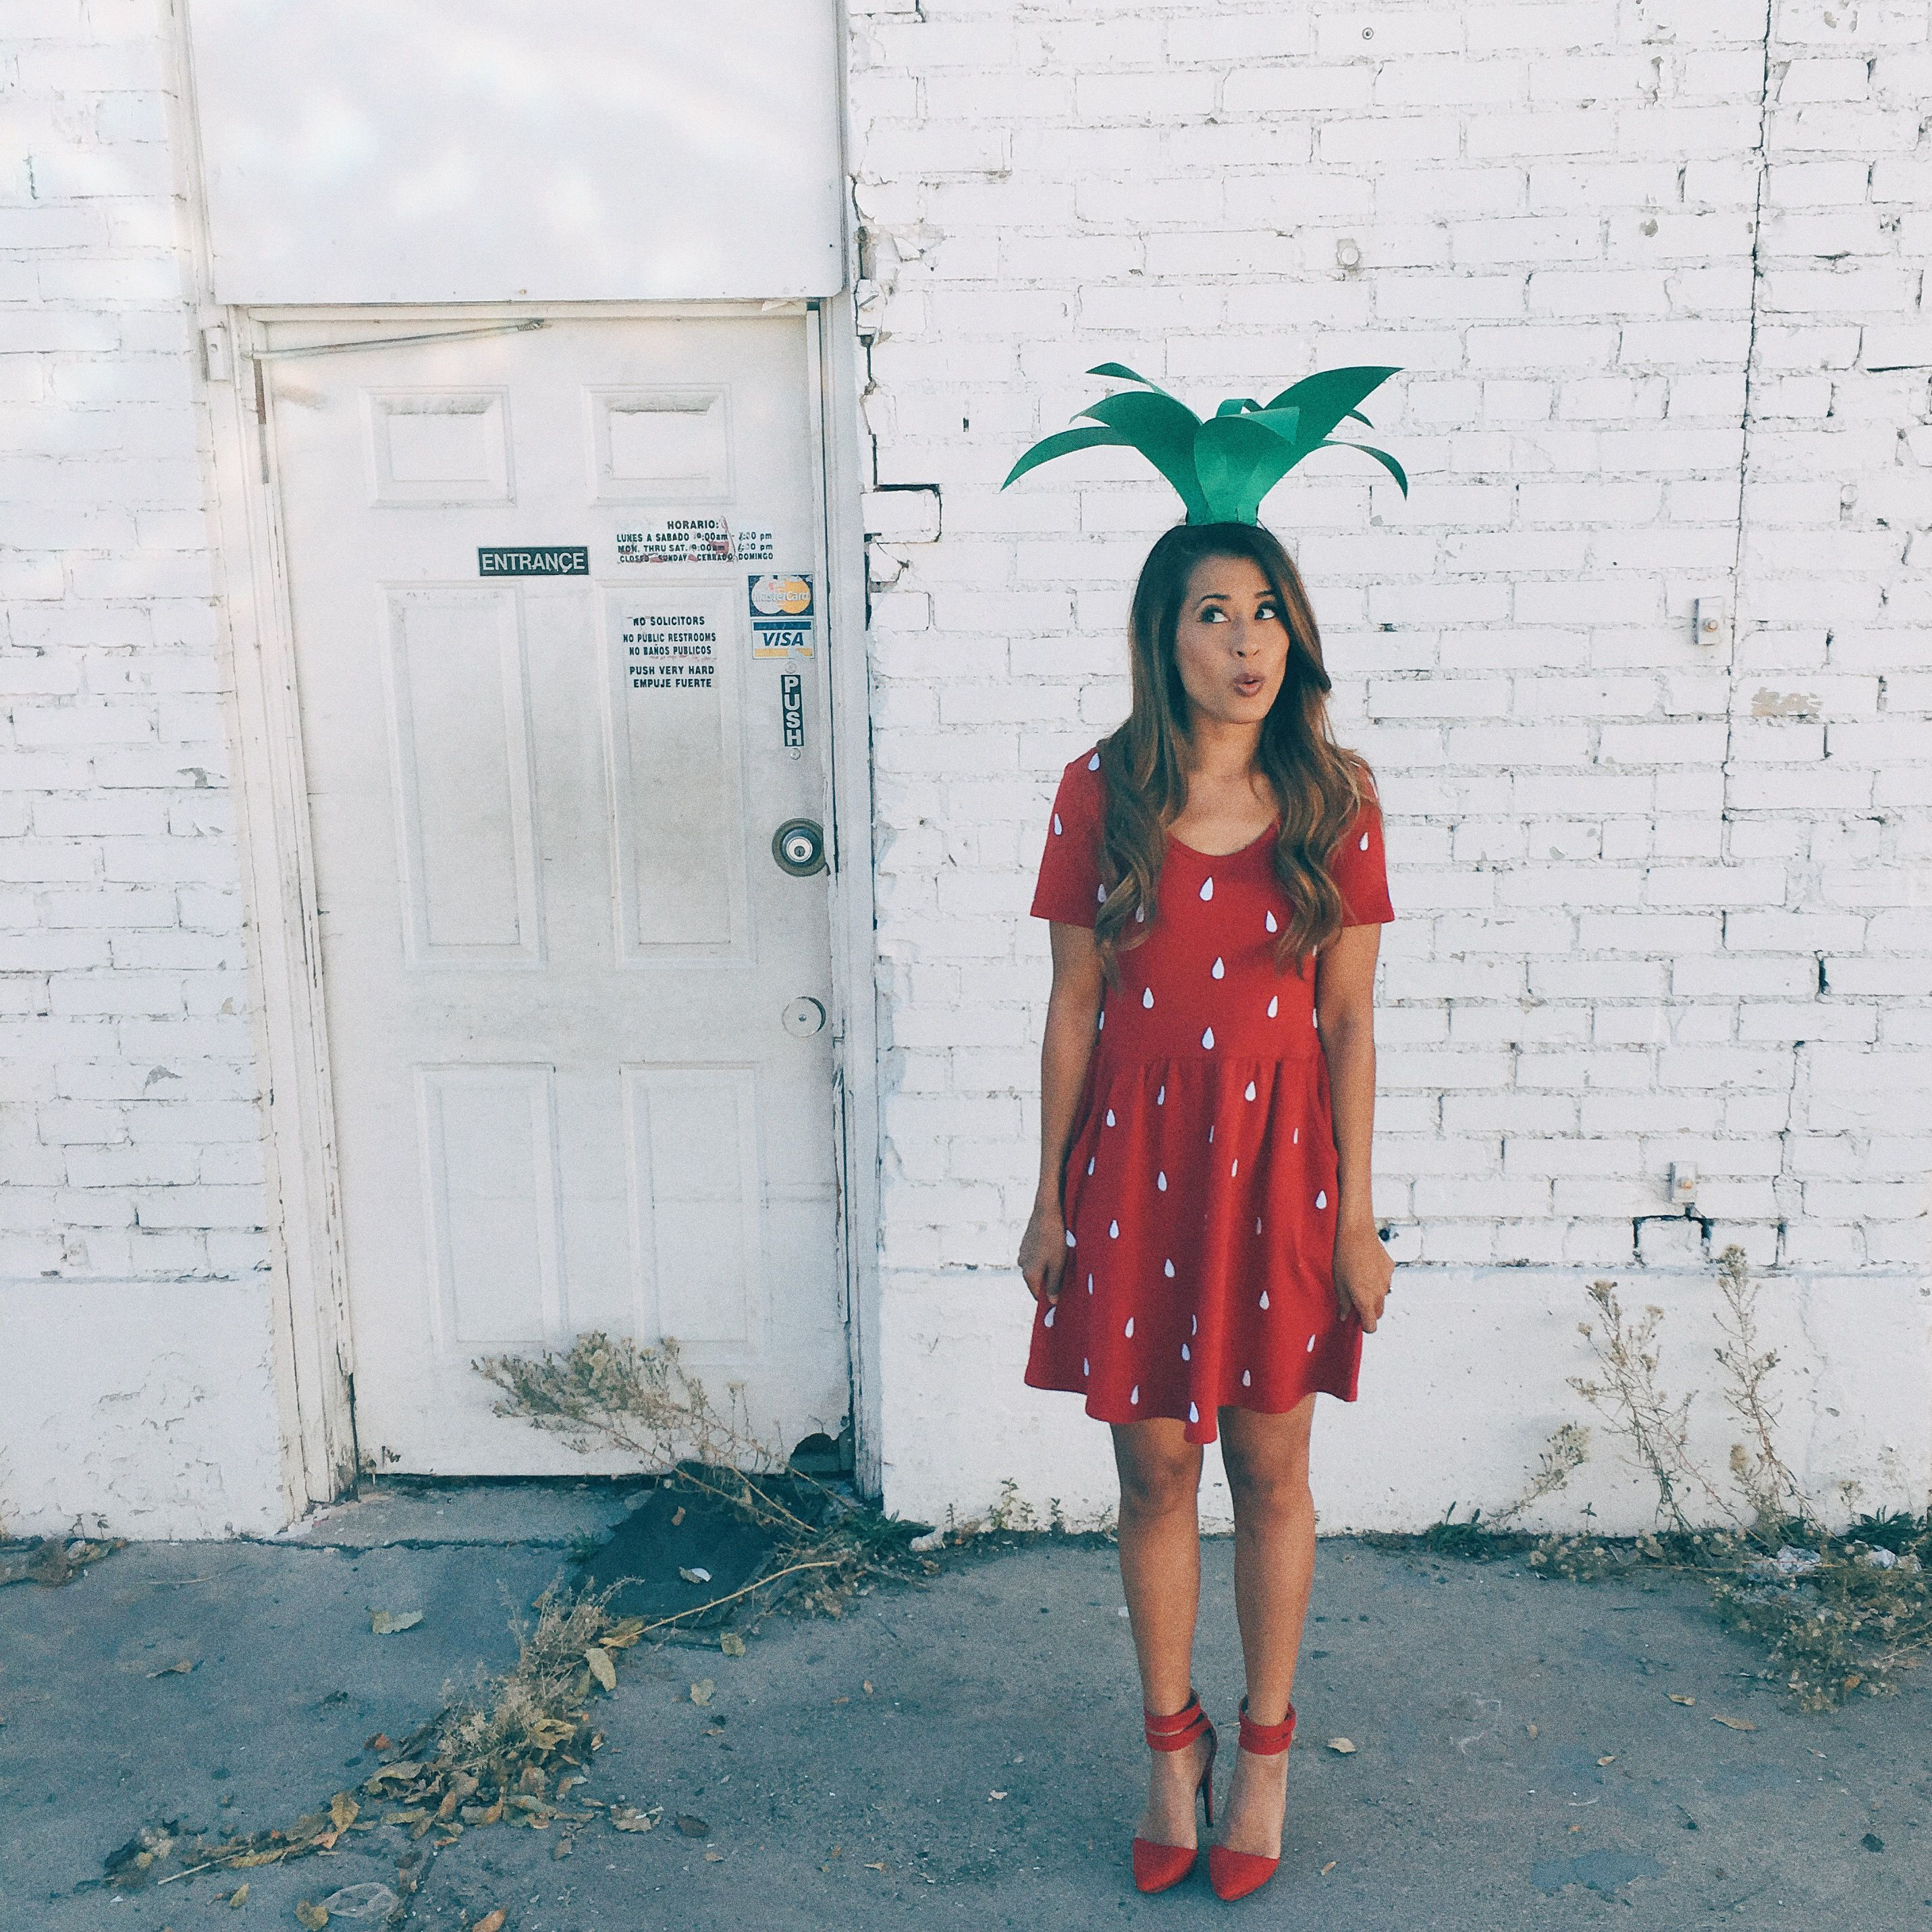 strawberry halloween costume auteur ariel blog youtube pinterest halloween kost m. Black Bedroom Furniture Sets. Home Design Ideas